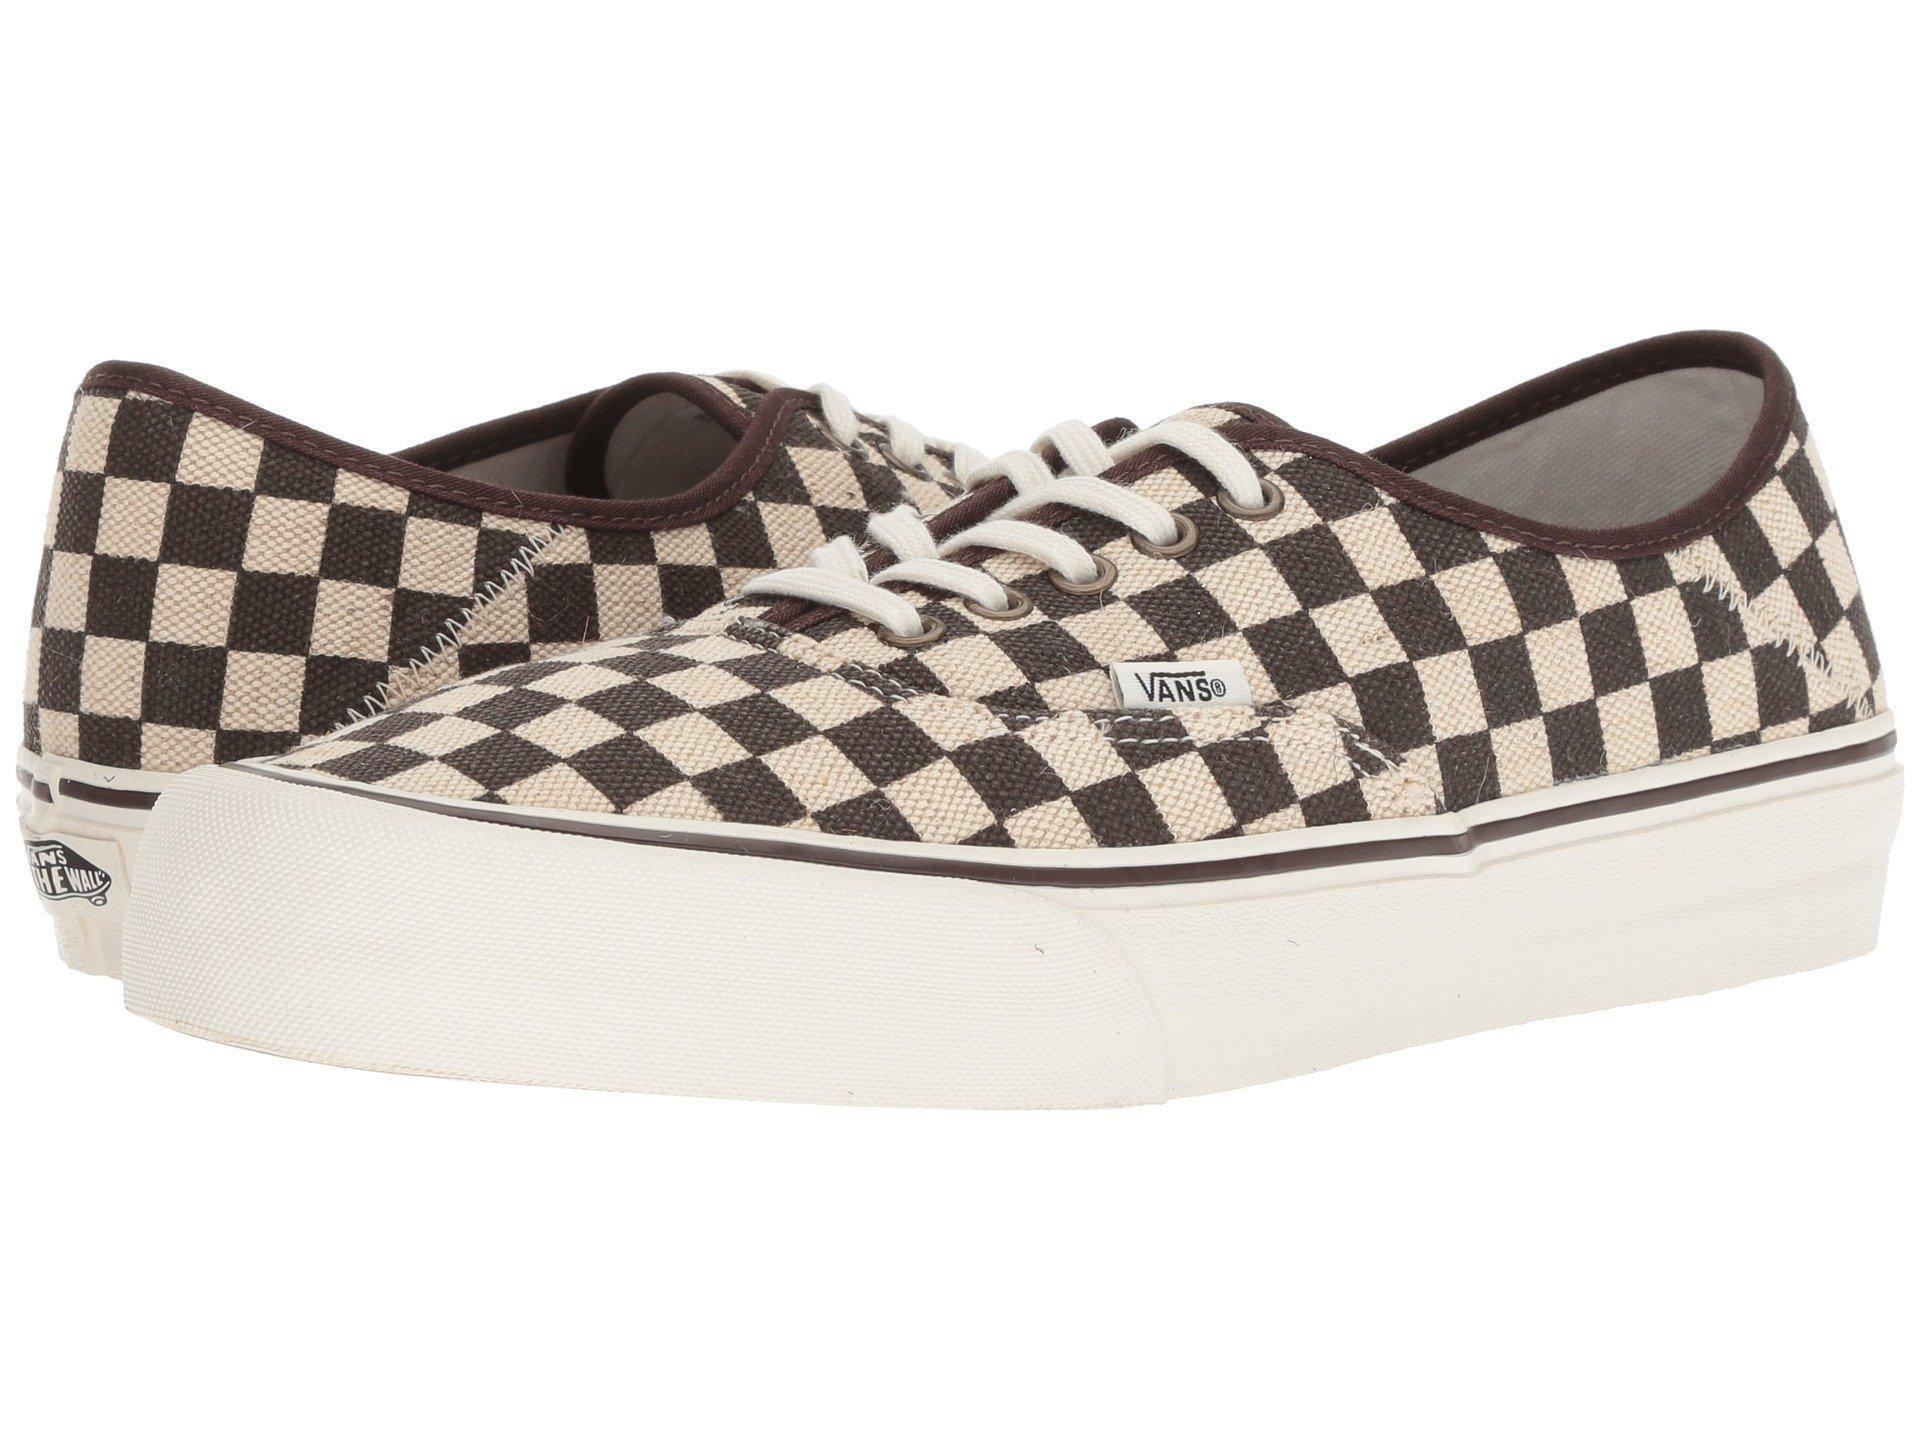 8b682a750f1 Vans. Men s Authentic Sf ((skulls) Black Plum marshmallow) Lace Up Casual  Shoes